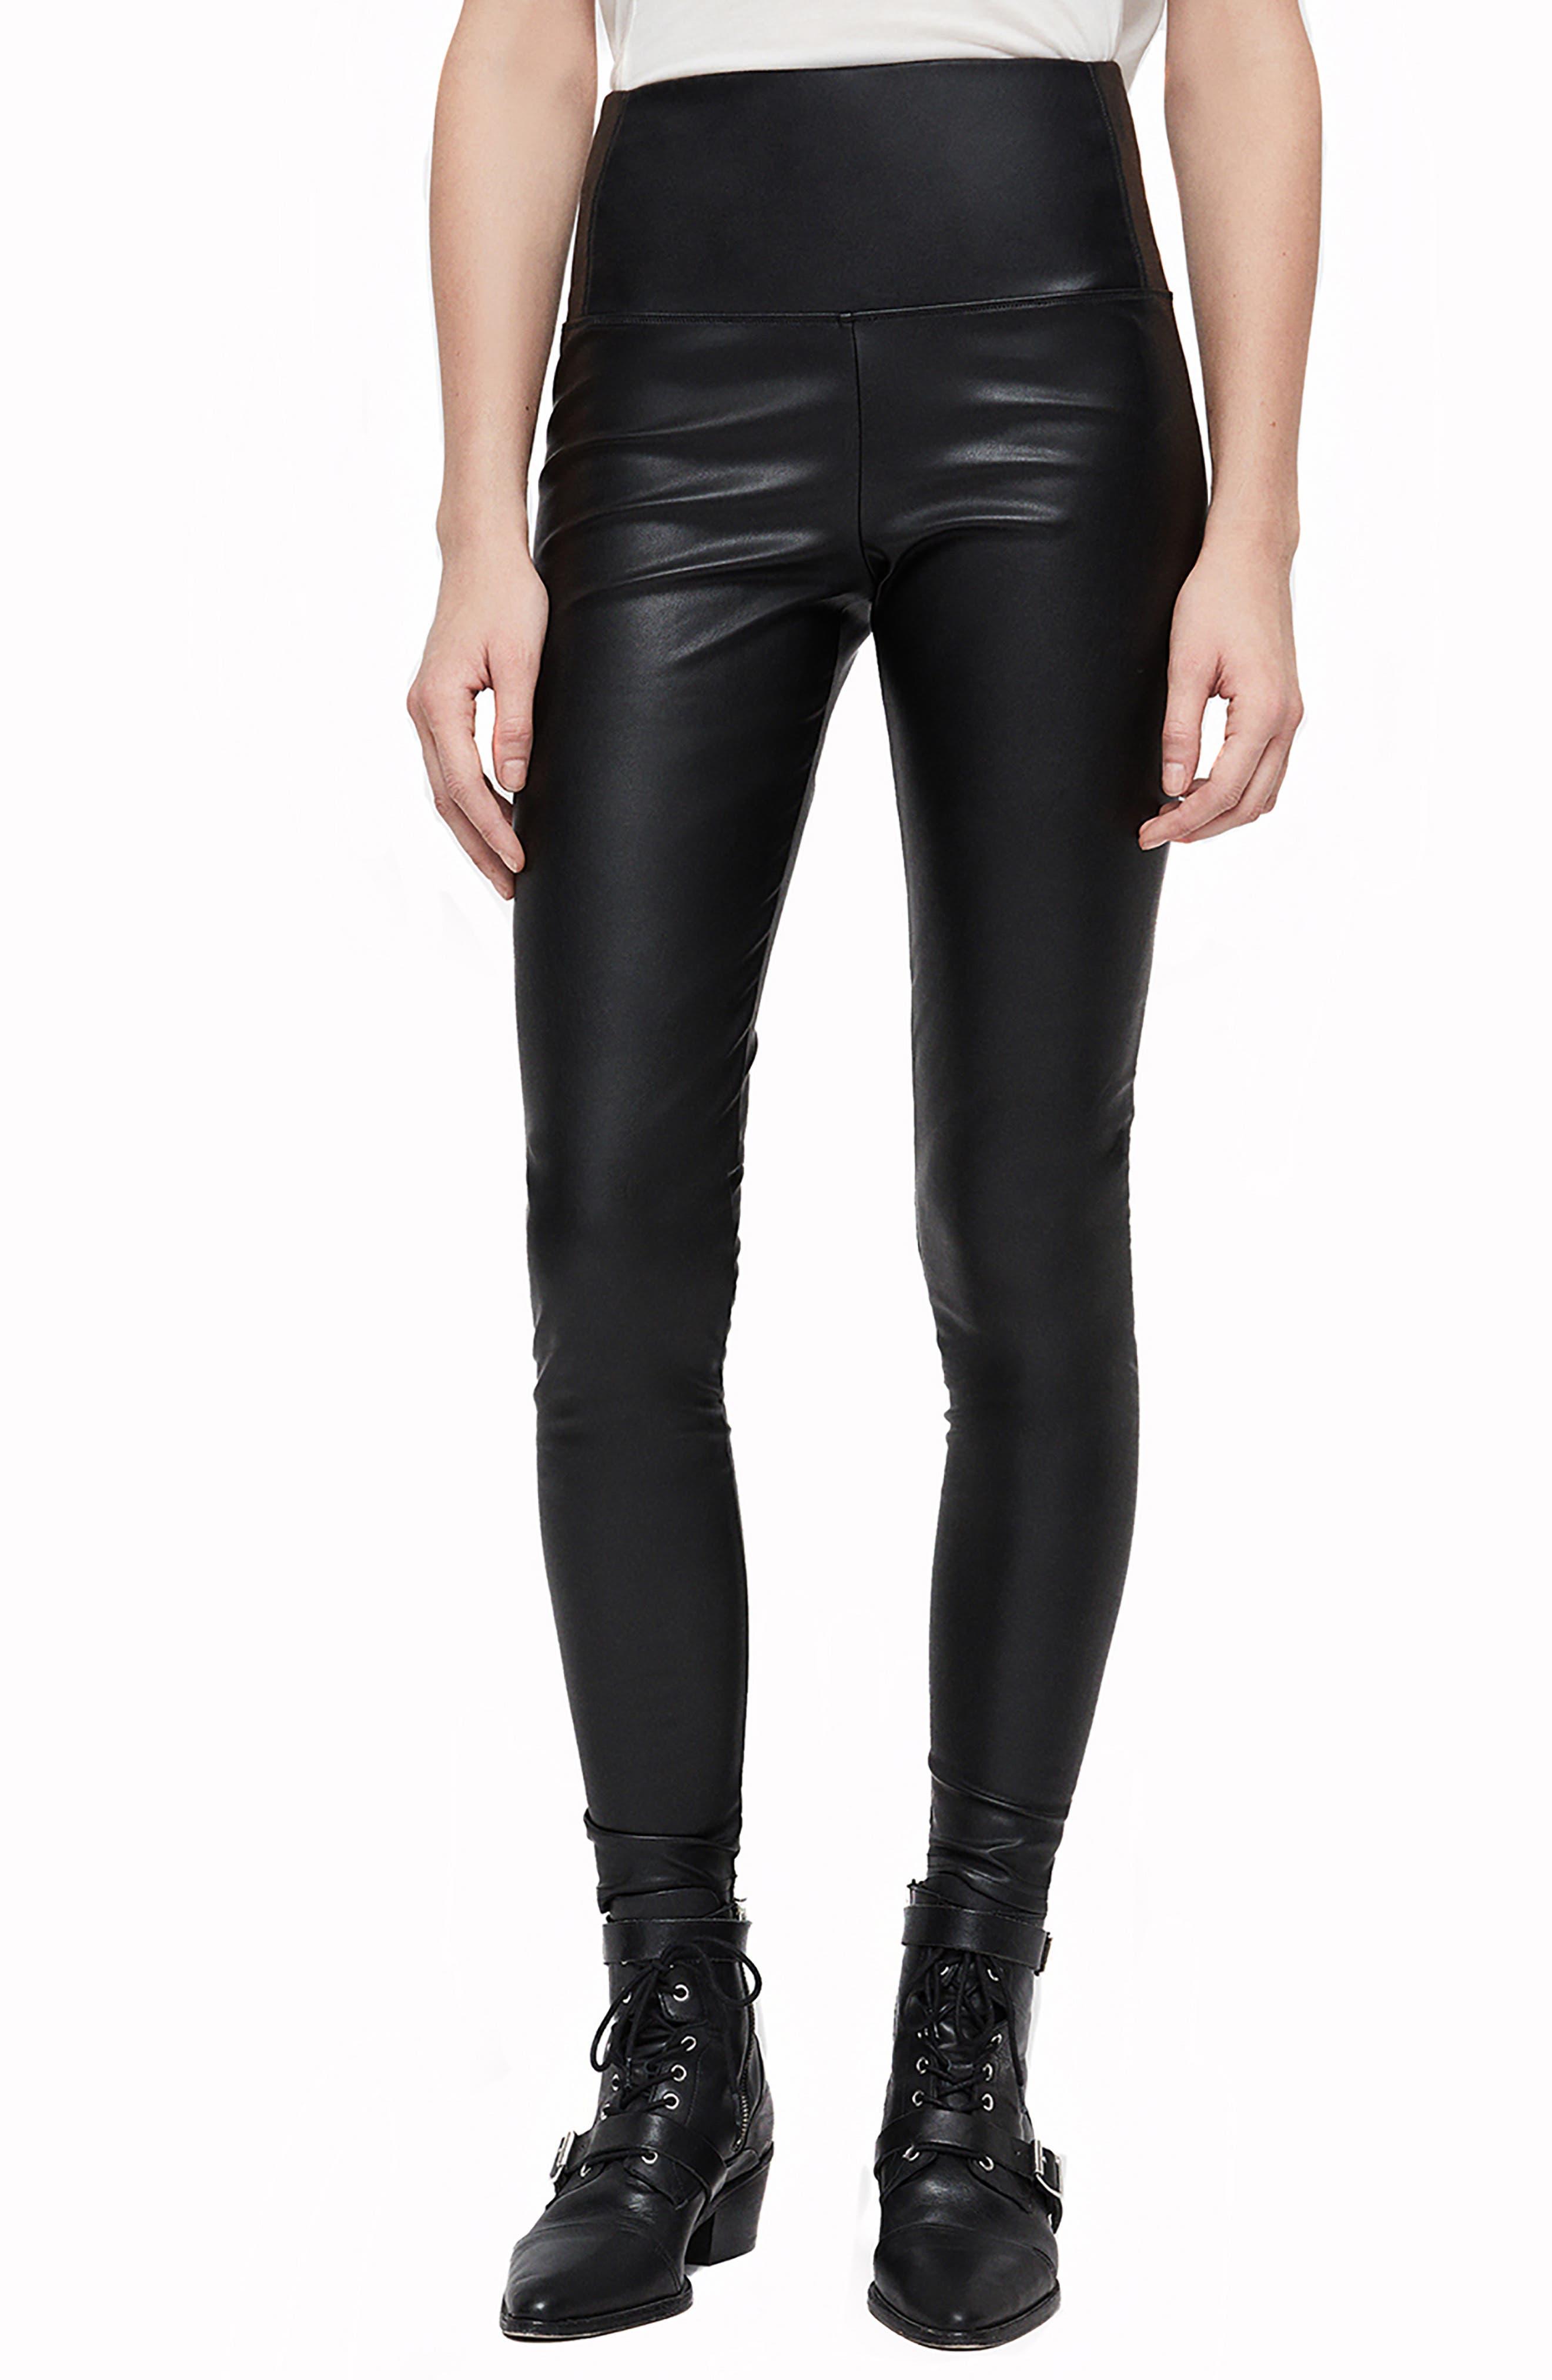 Cora Faux Leather Leggings,                             Main thumbnail 1, color,                             BLACK